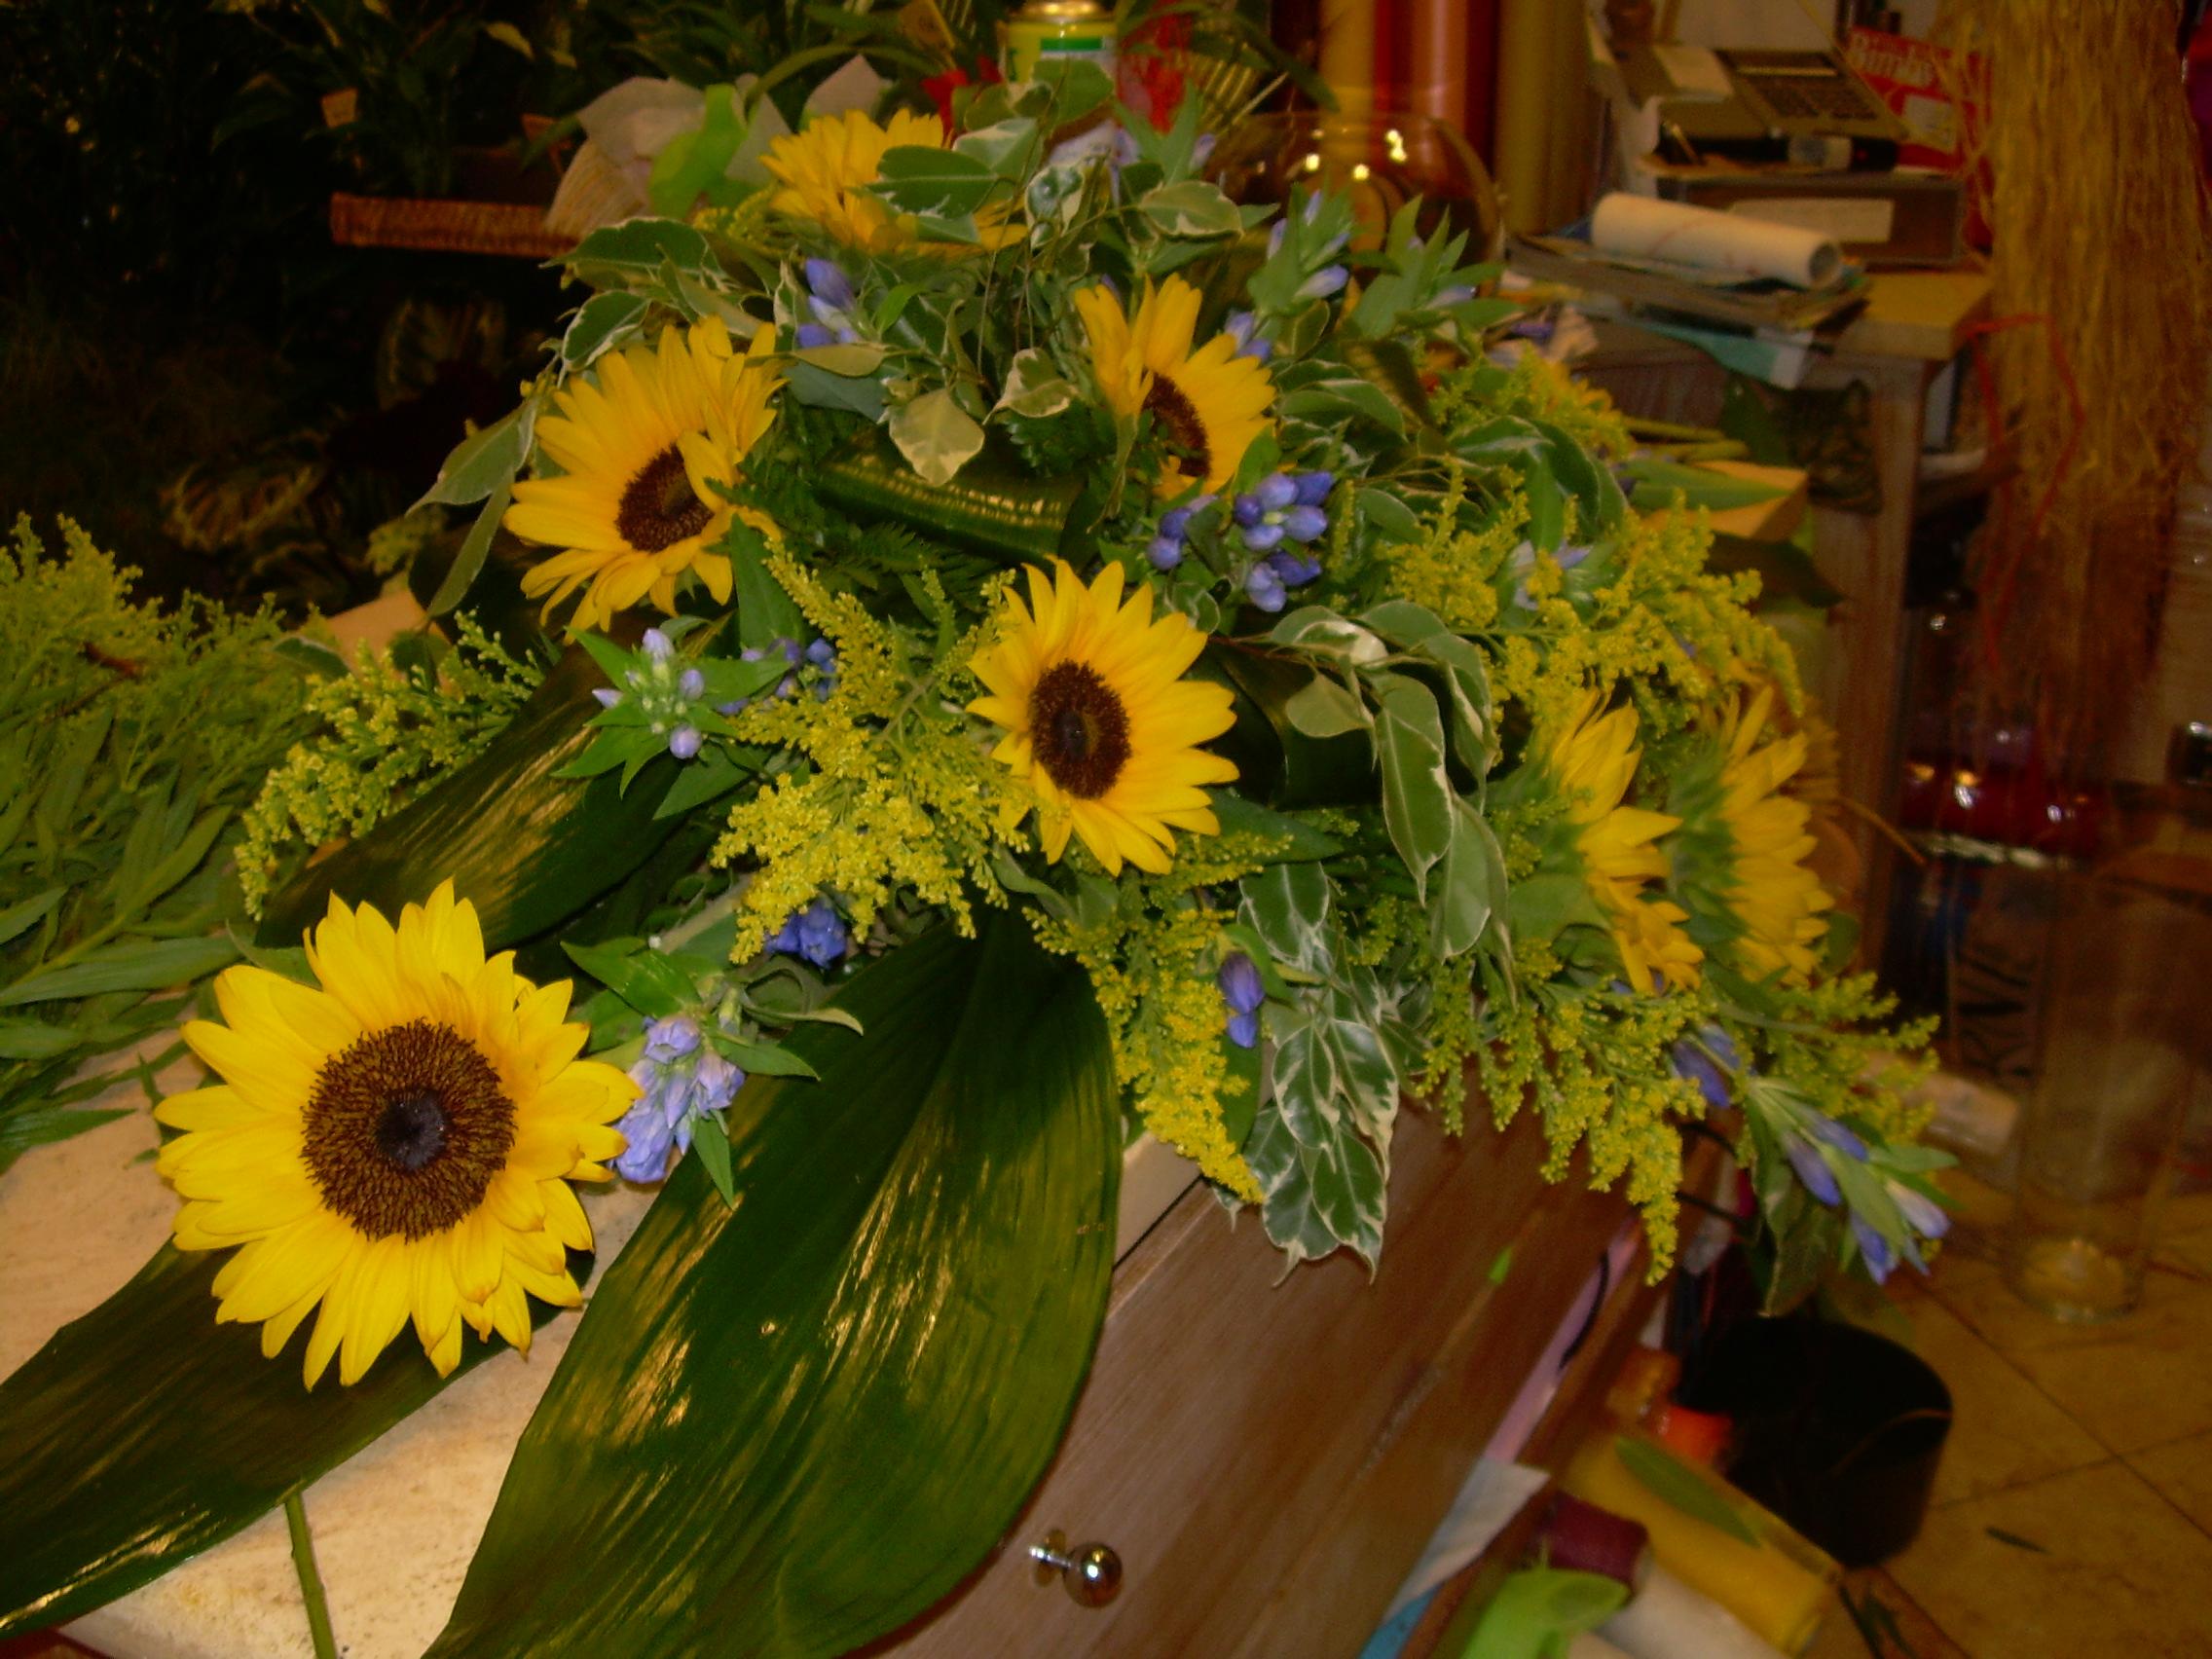 Centrotavola Con Girasoli Matrimonio : Elisabetta fiori e piante centrotavola con girasoli